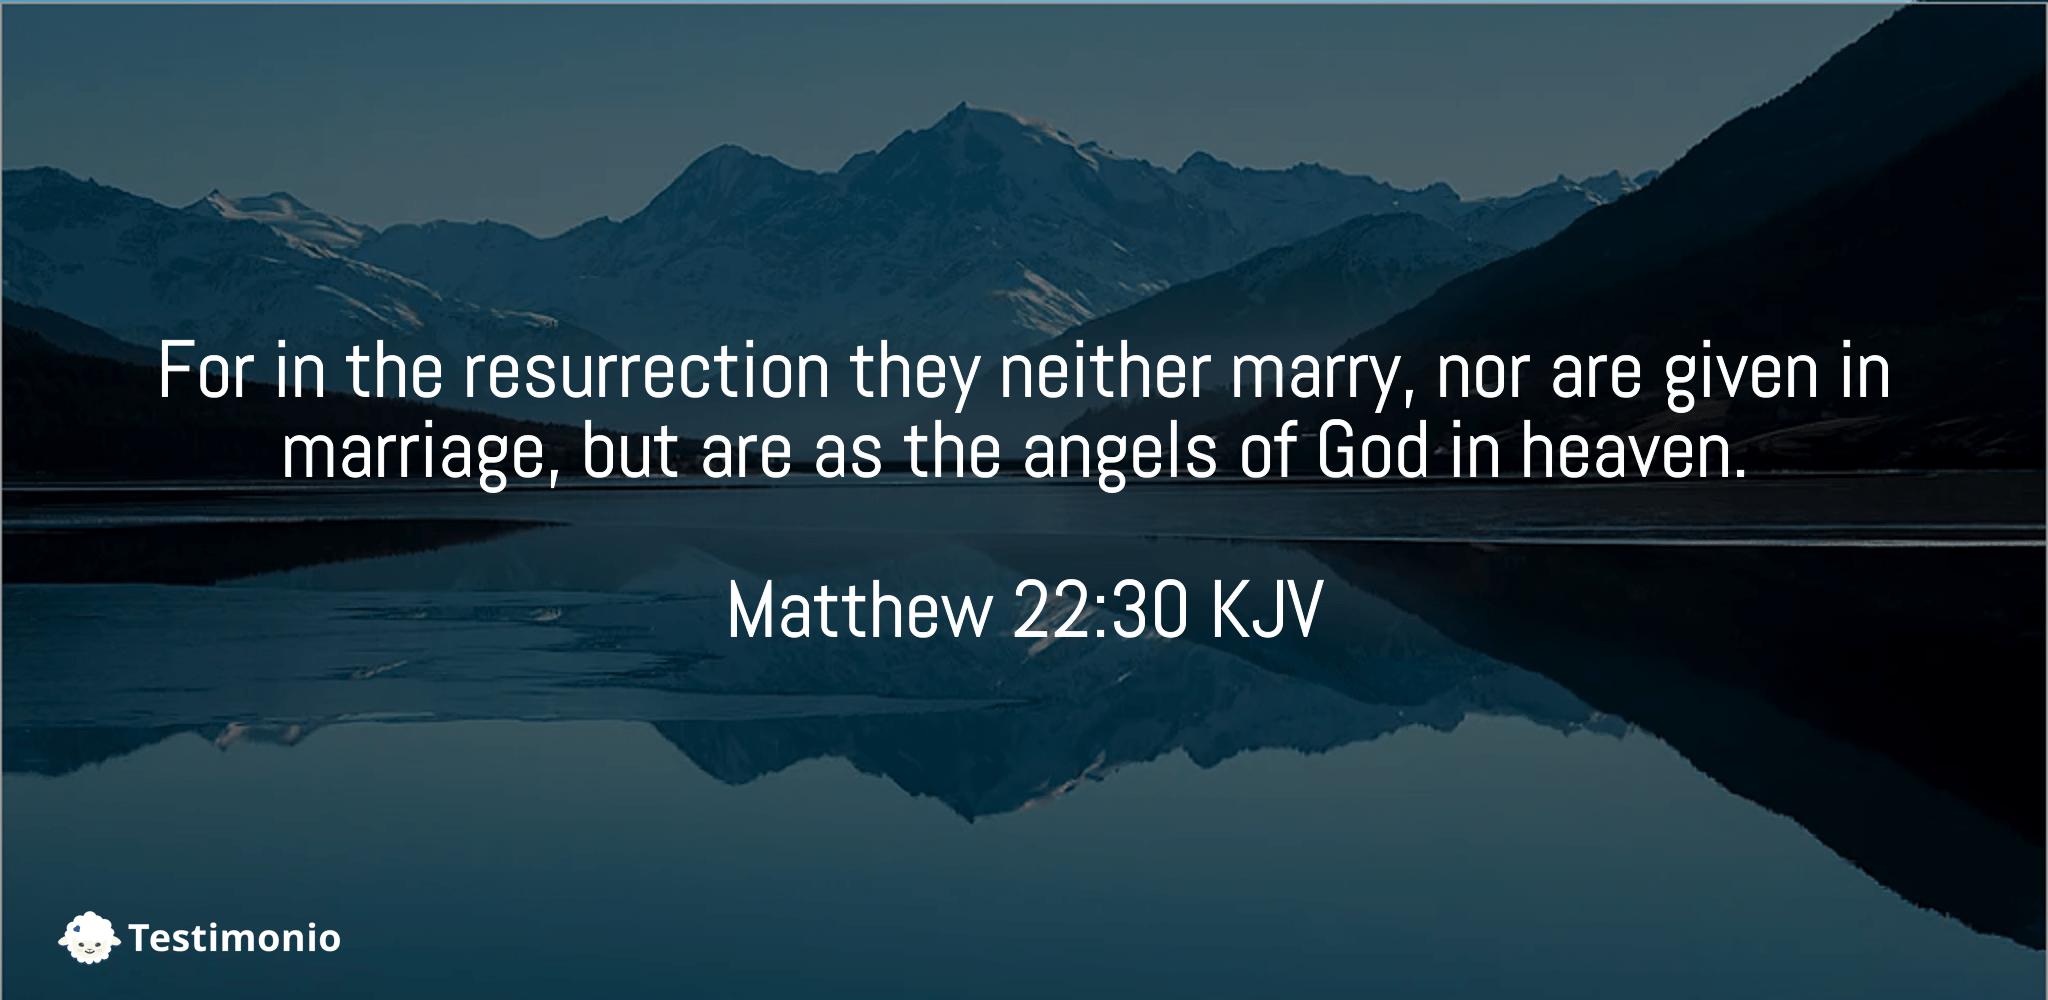 Matthew 22:30